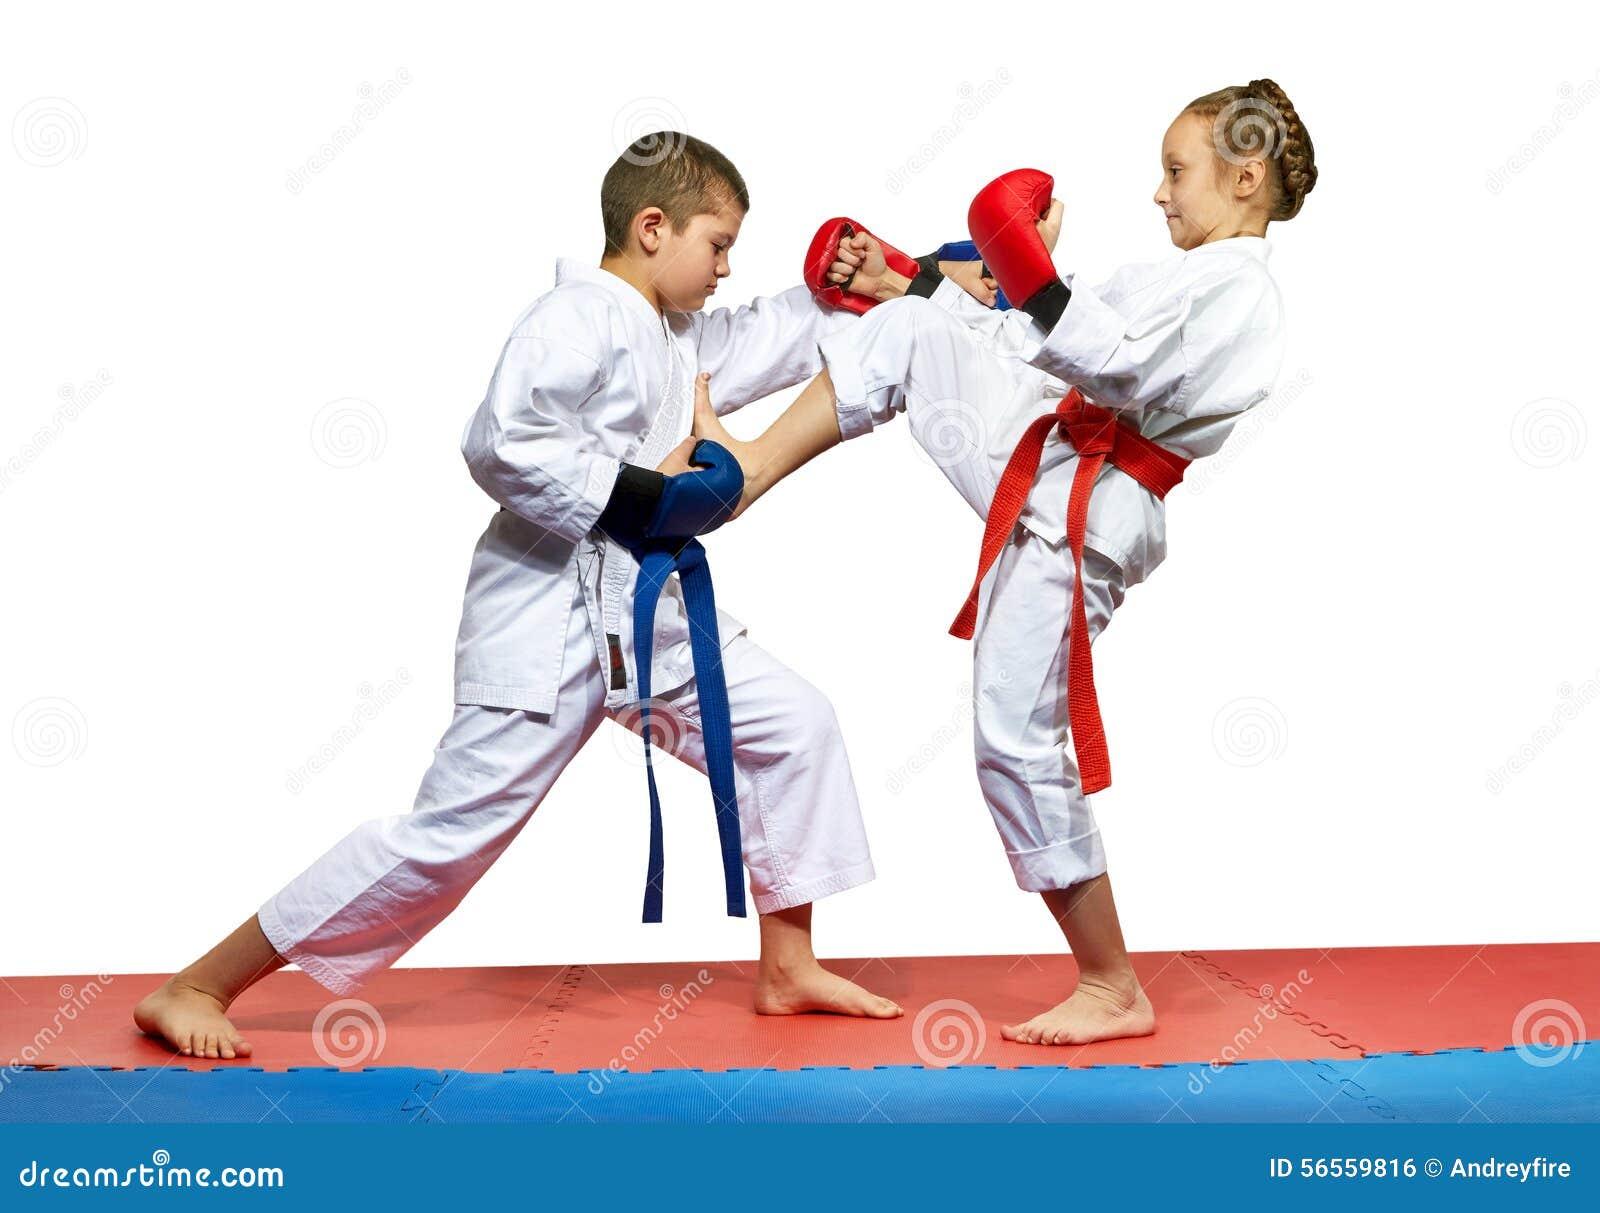 Download Το κορίτσι κτυπά Mae το αγόρι Geri κτυπά το Kizami Tsuki Στοκ Εικόνες - εικόνα από επιτυχία, φίλων: 56559816